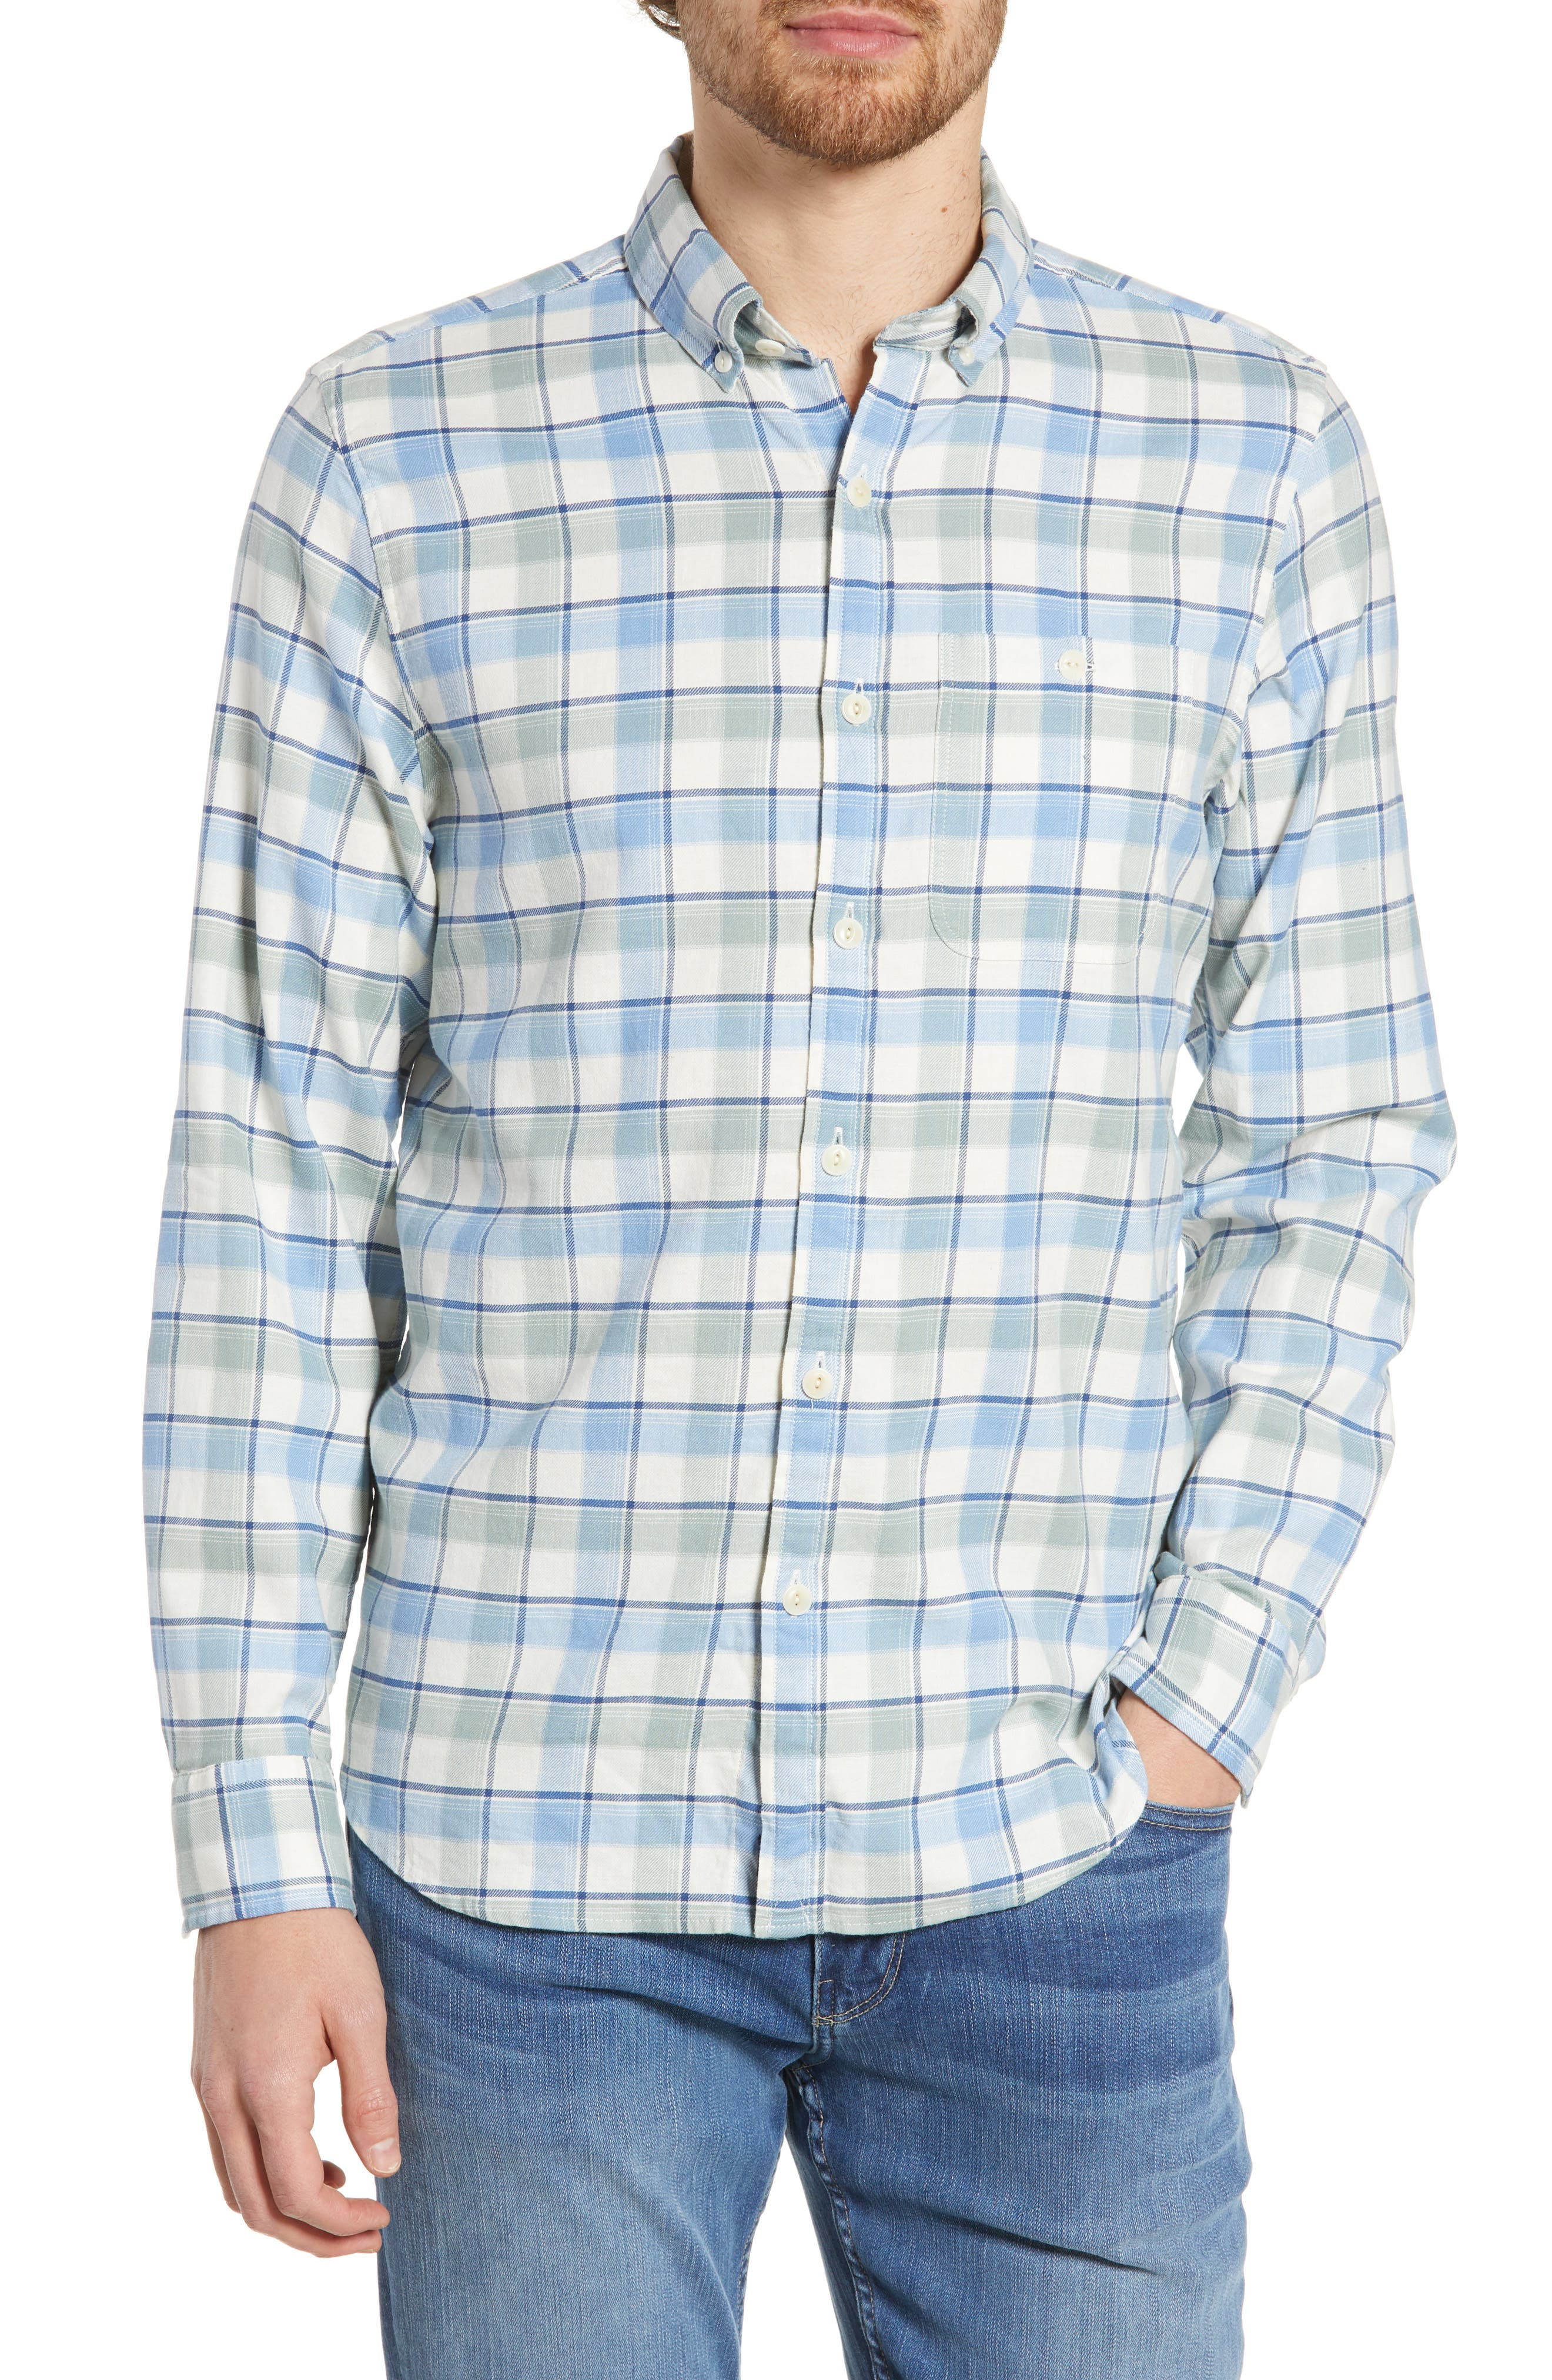 VINEYARD VINES Bayside Slim Fit Plaid Sport Shirt, Main, color, LIGHT SAGE